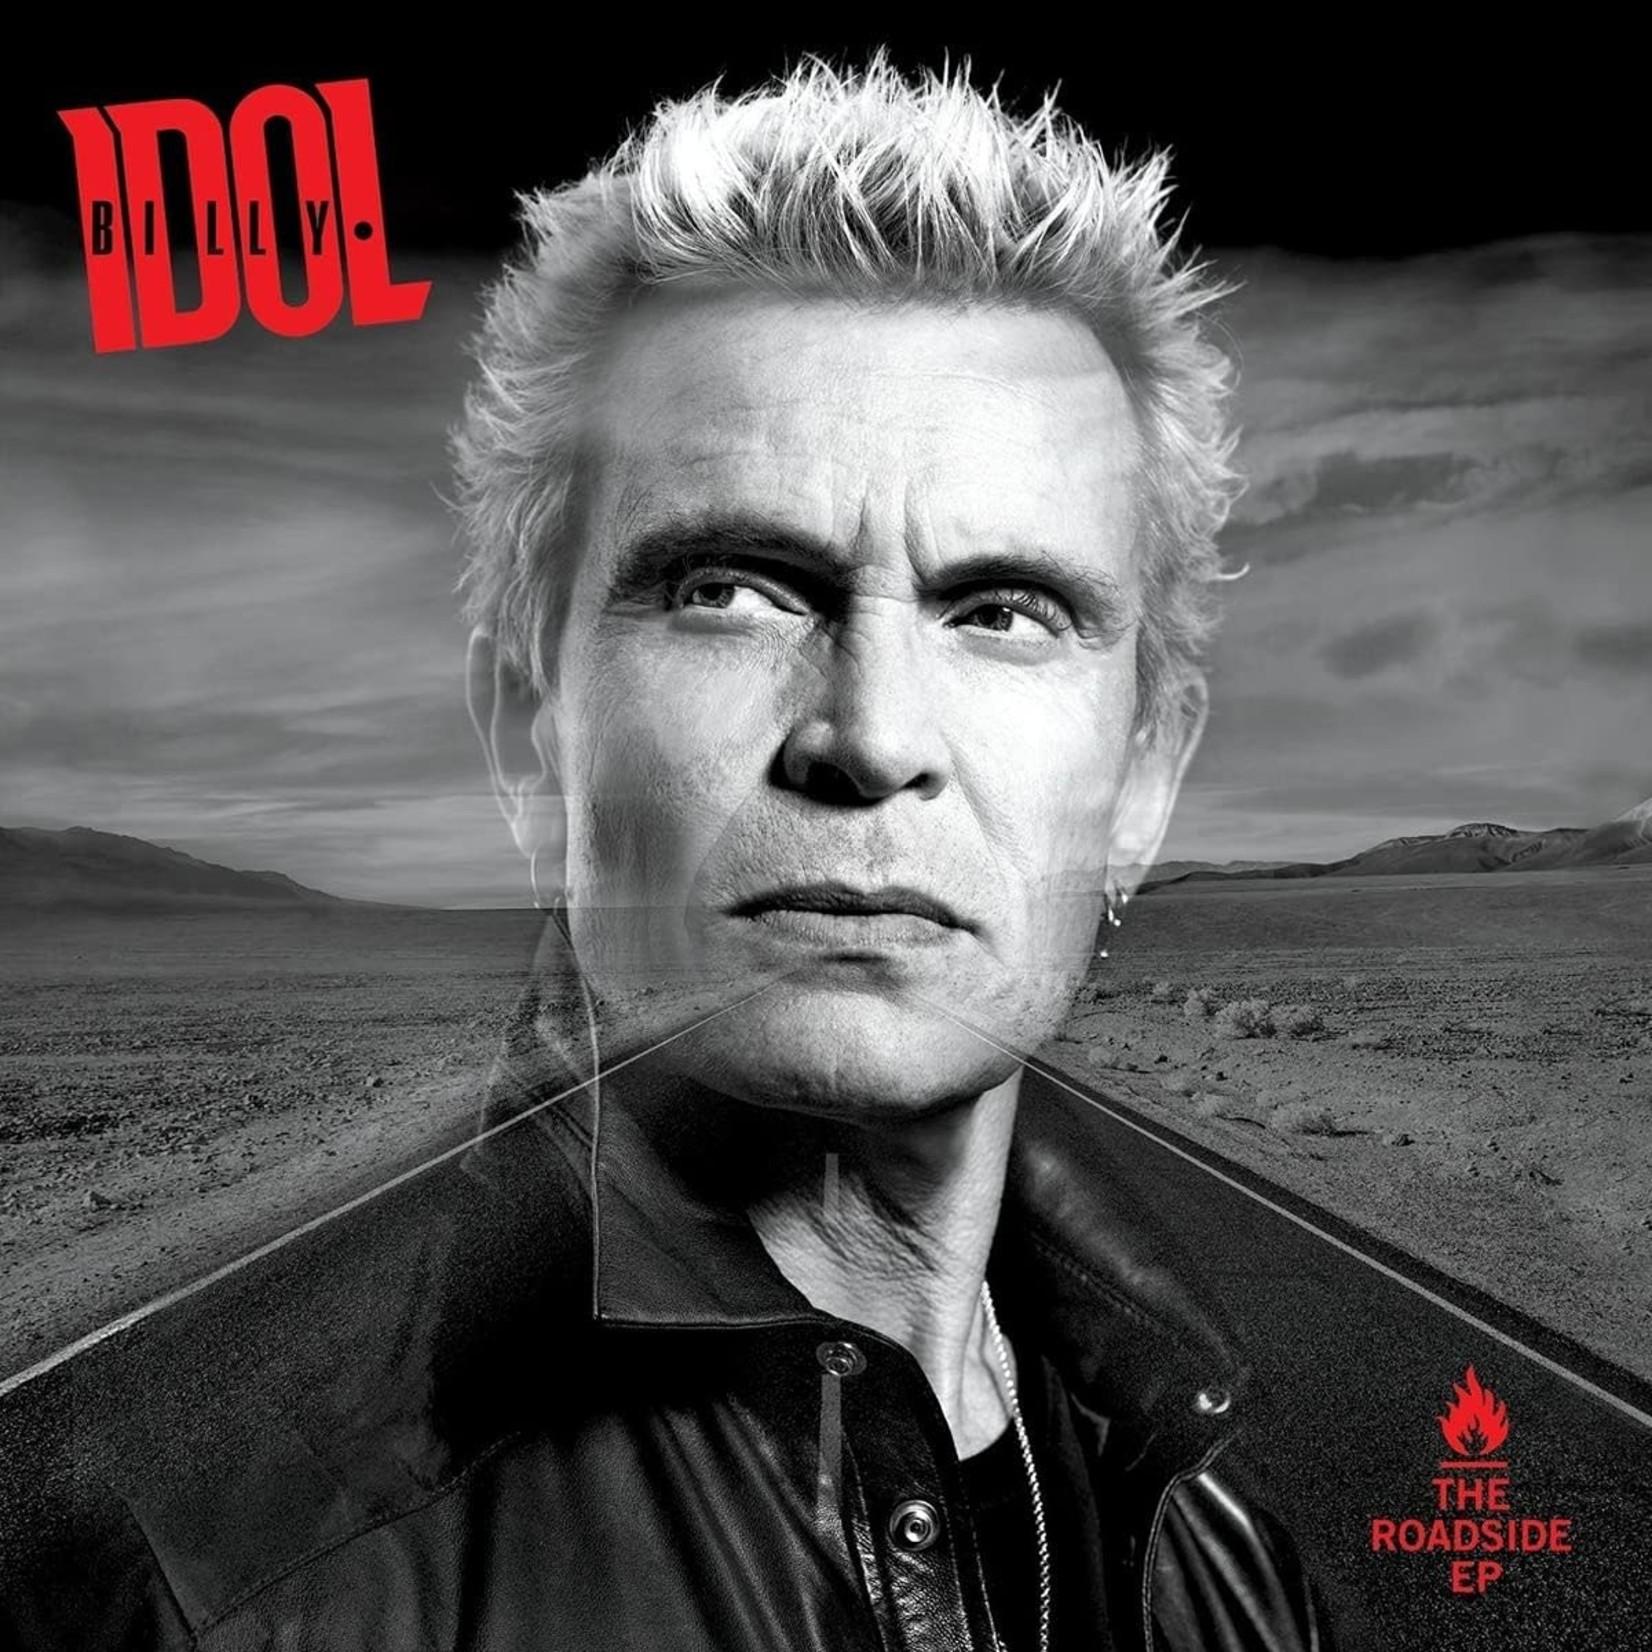 Vinyl Billy Idol - The Roadside EP (Blue Vinyl)